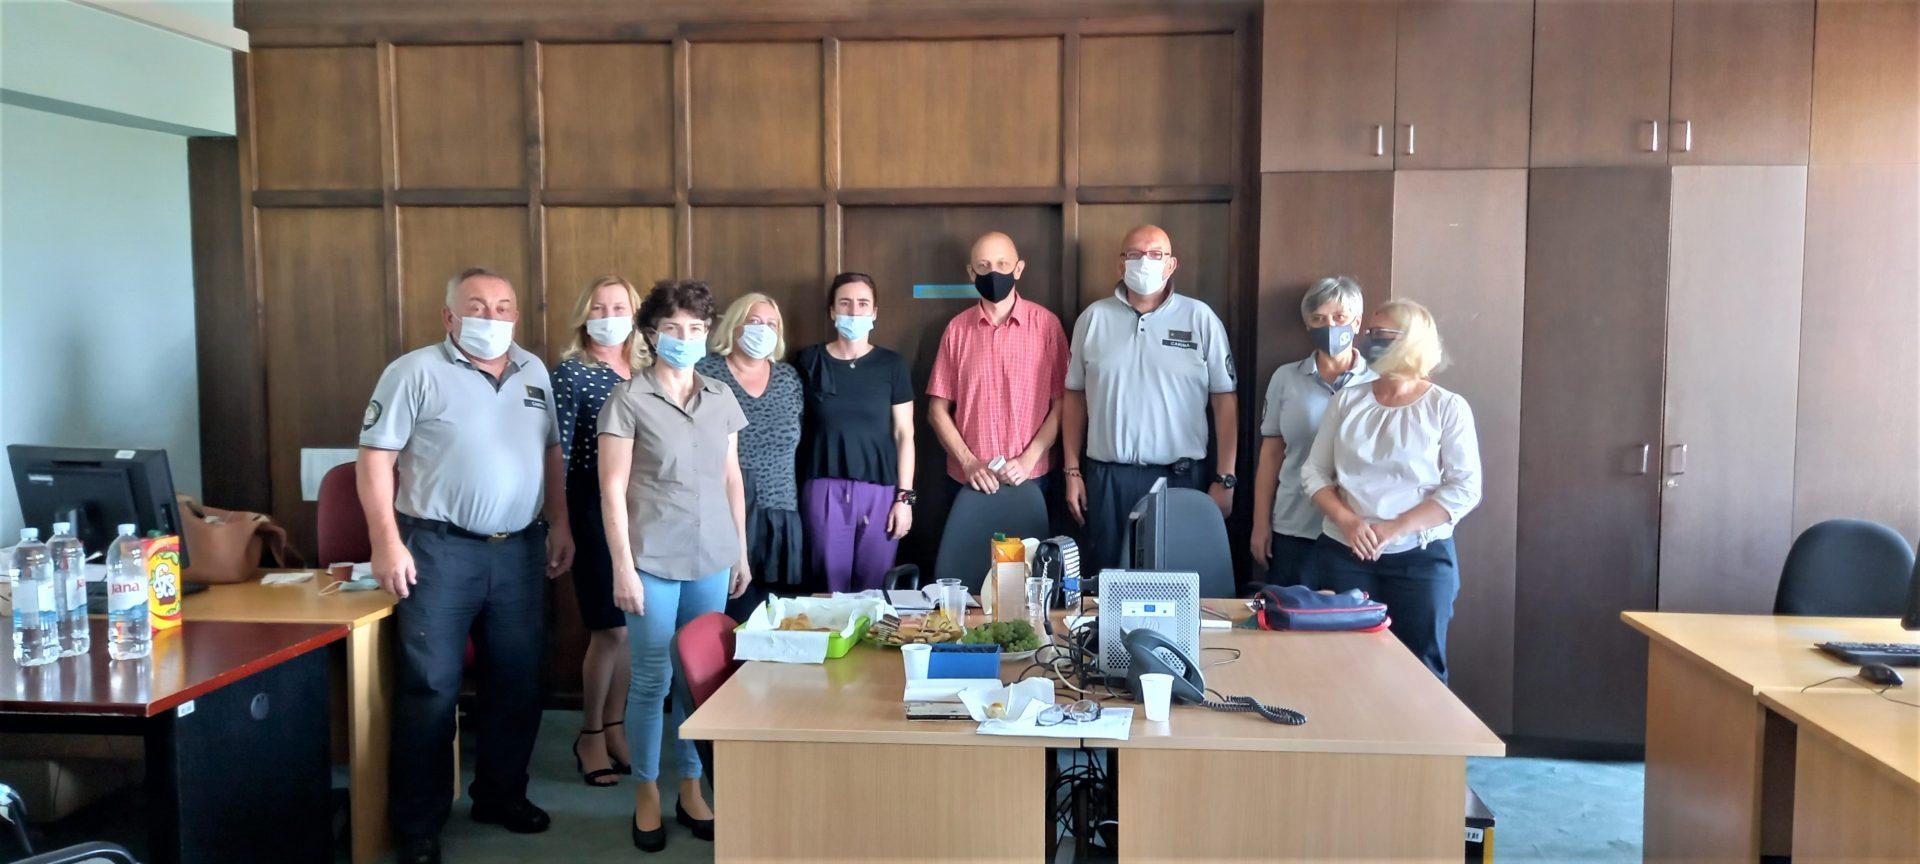 S članovima podružnice Carinski ured Varaždin povodom Dana carinske službe